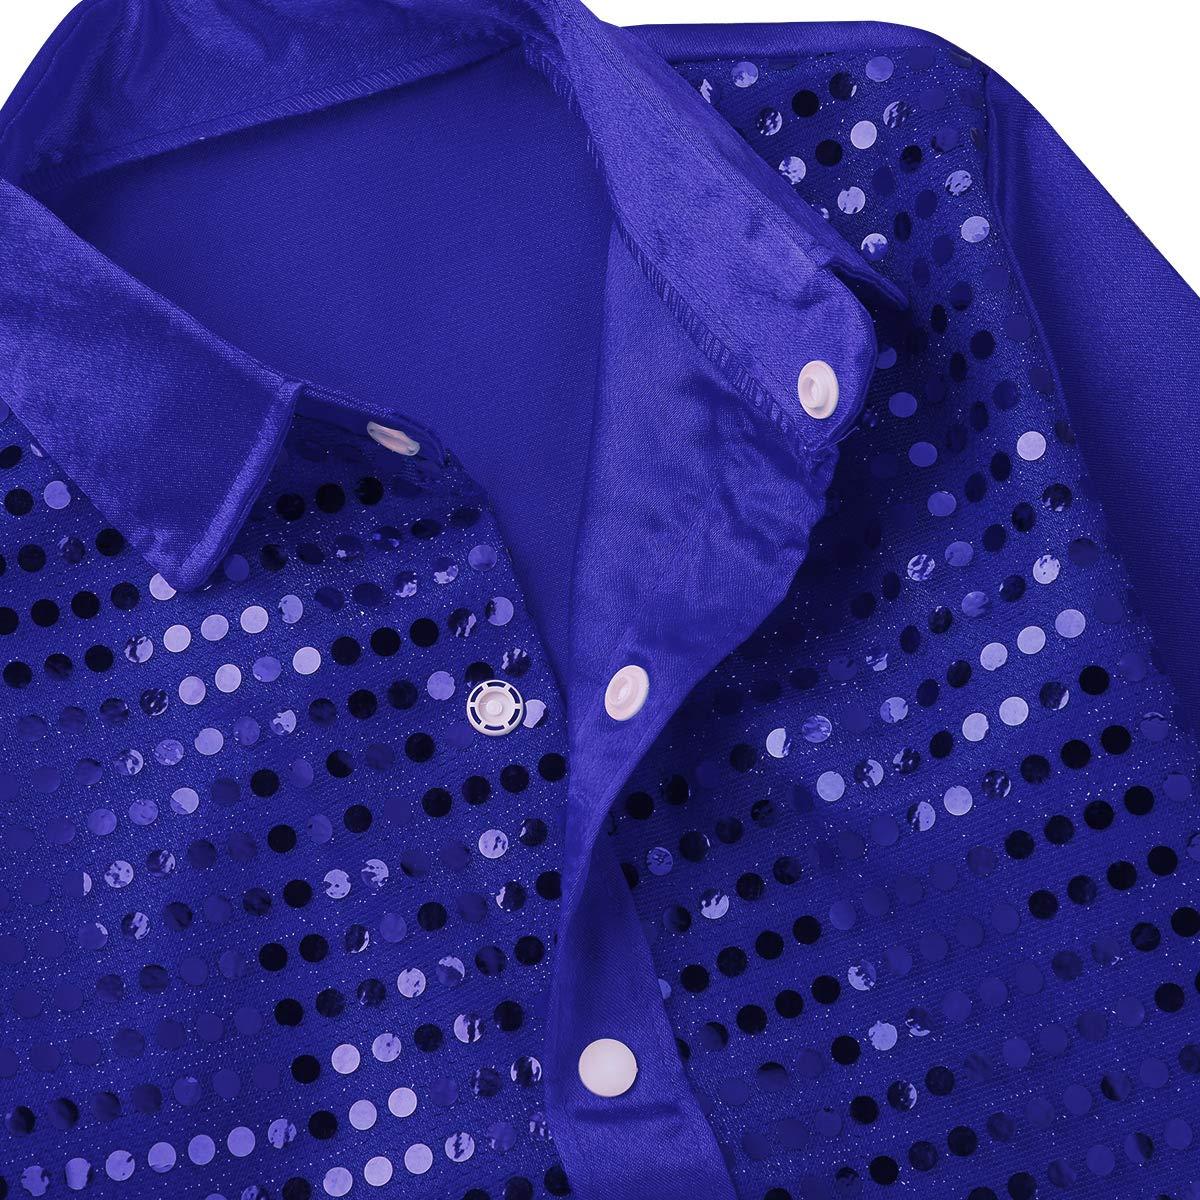 JEATHA Kids Boys Long Sleeves Lapel Shiny Sequins Shirts Hip Hop Jazz Latin Street Dancing Stage Performance Costumes